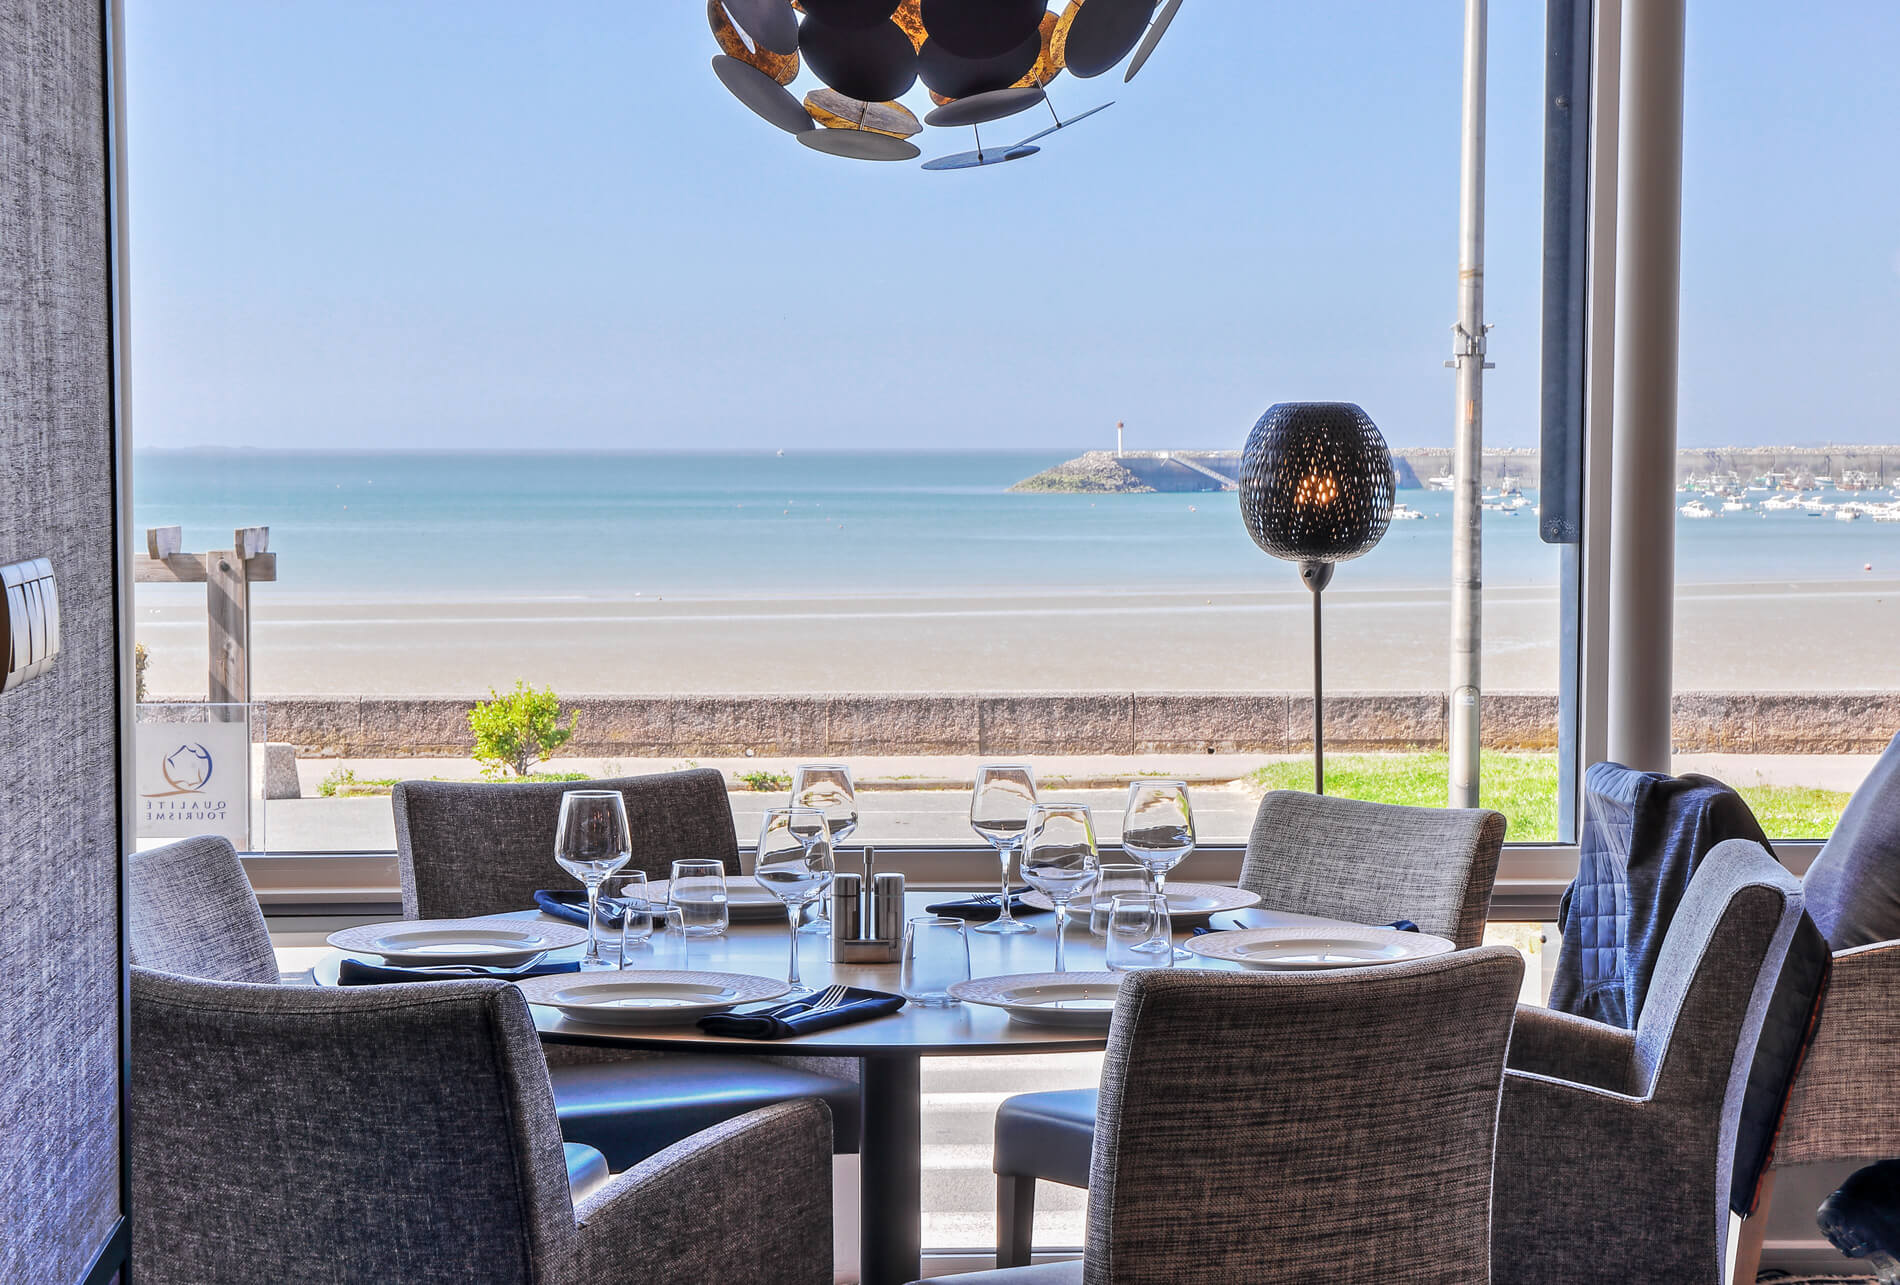 Restaurant Hôtel La Plage - Erquy